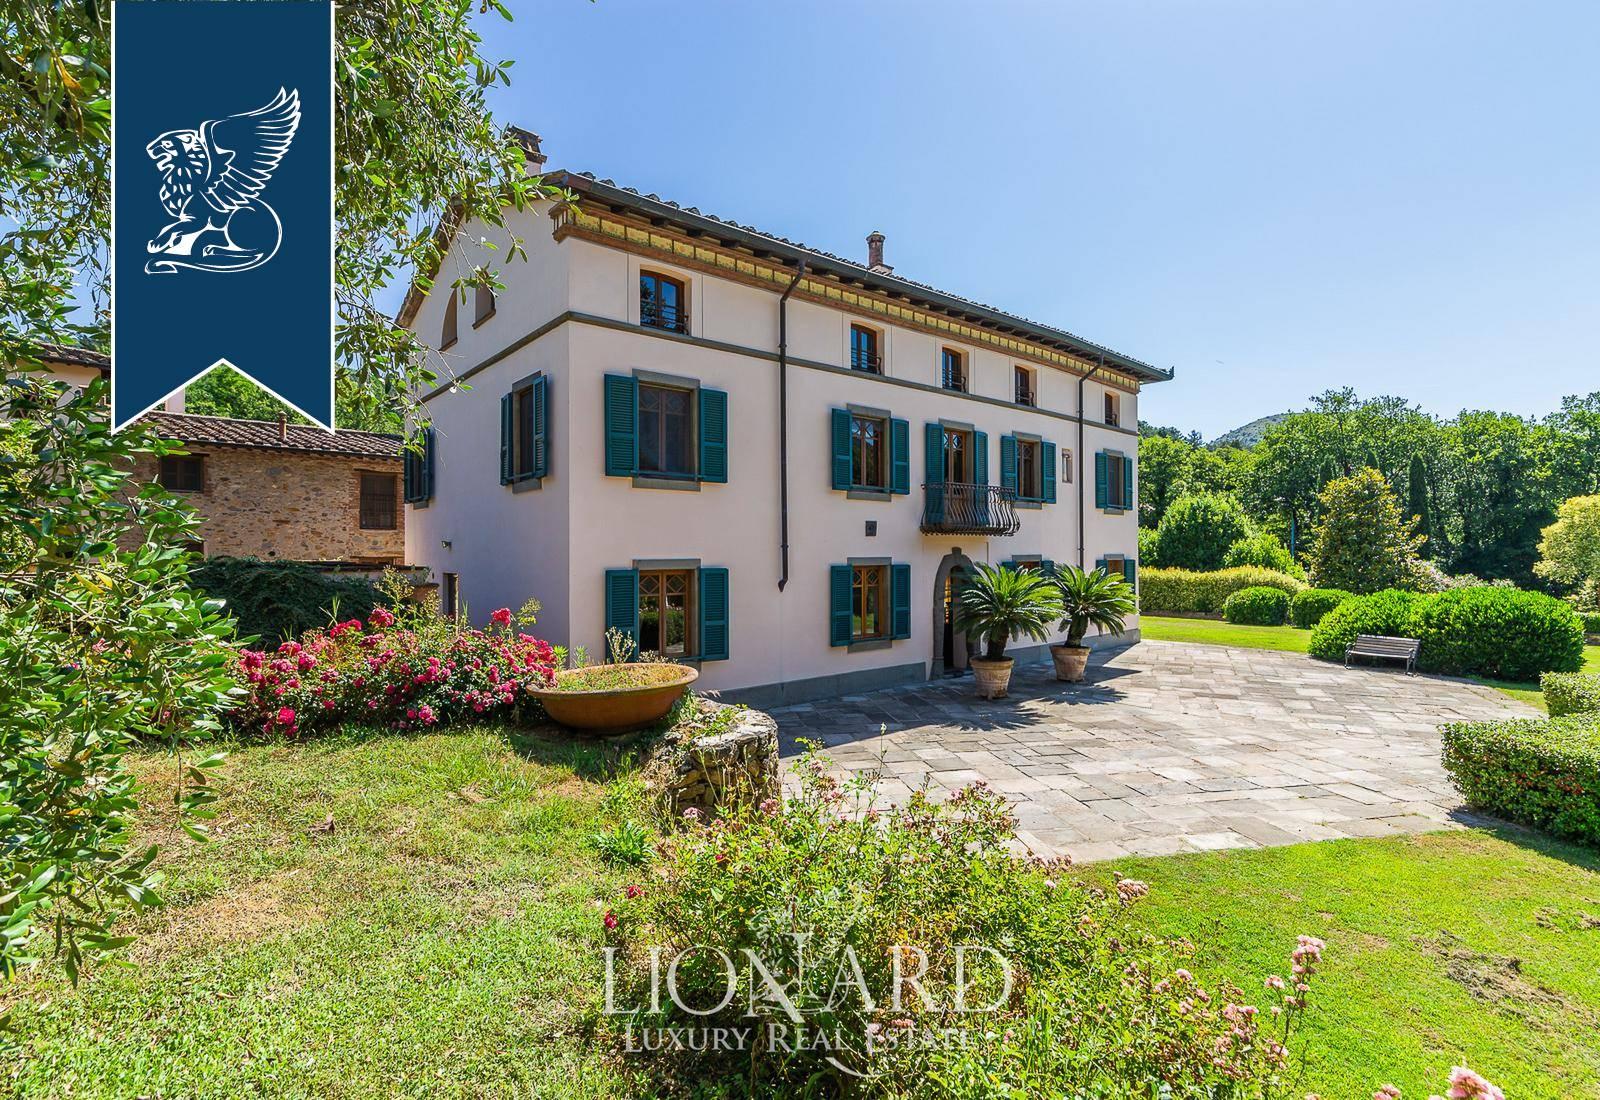 Villa in Vendita a Lucca: 0 locali, 900 mq - Foto 9